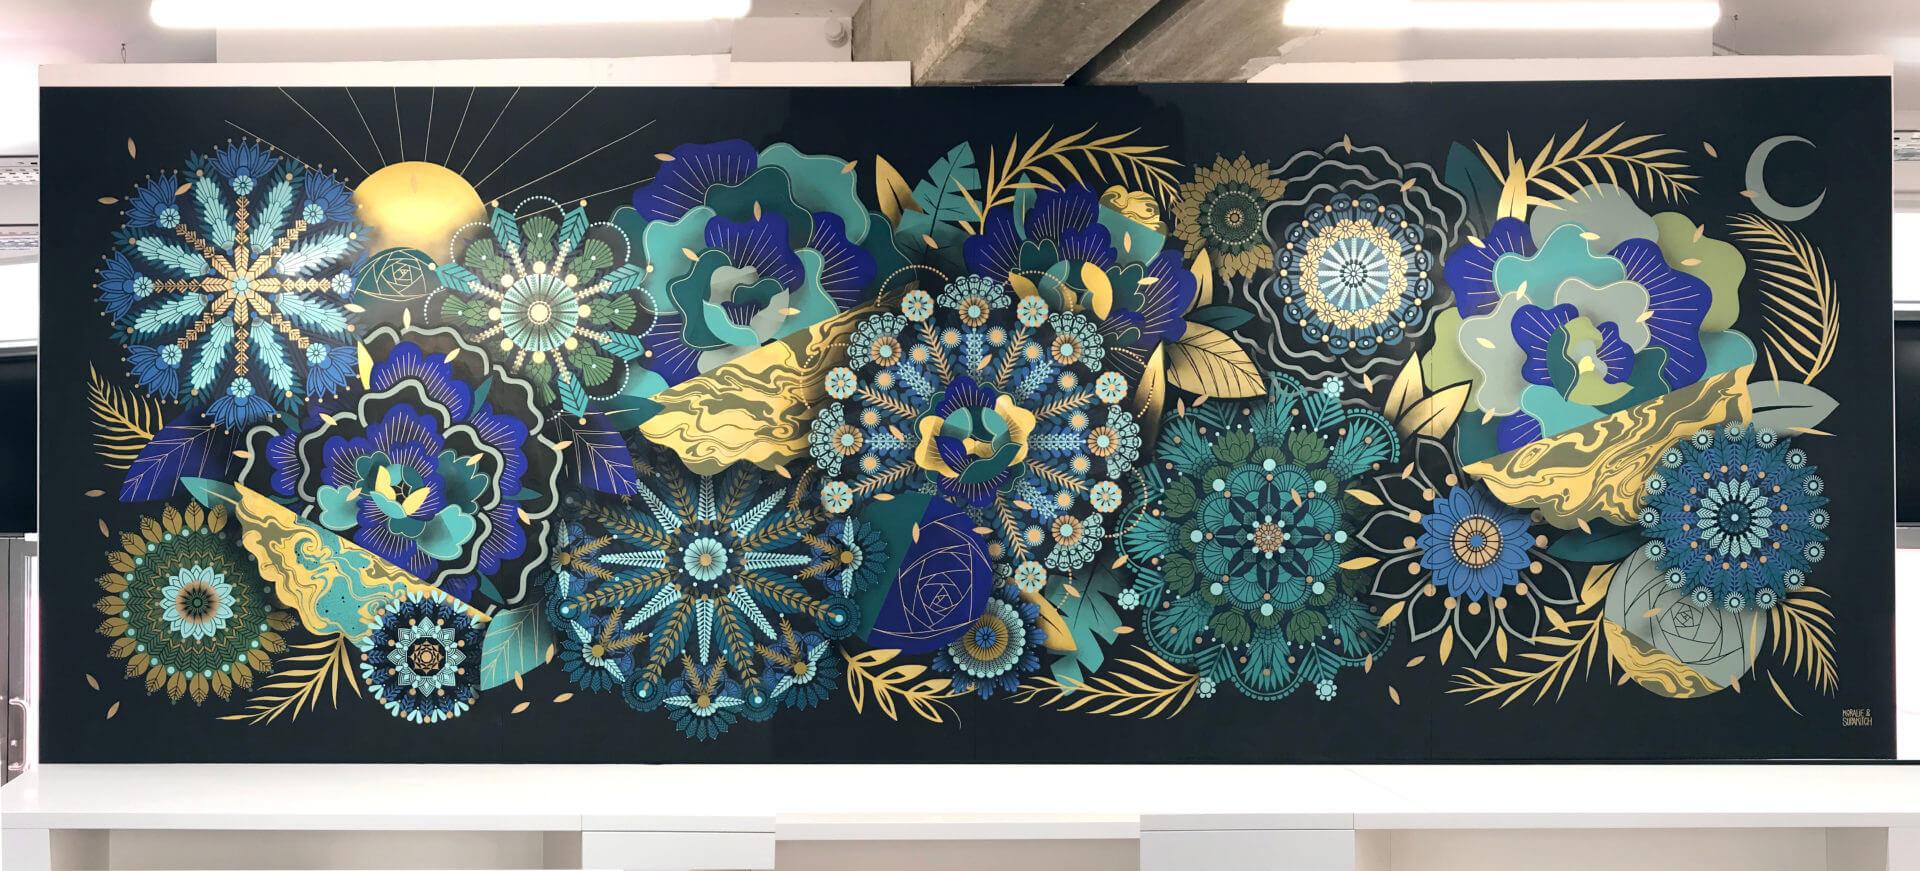 Oeuvre des artistes Supakitch et Koralie